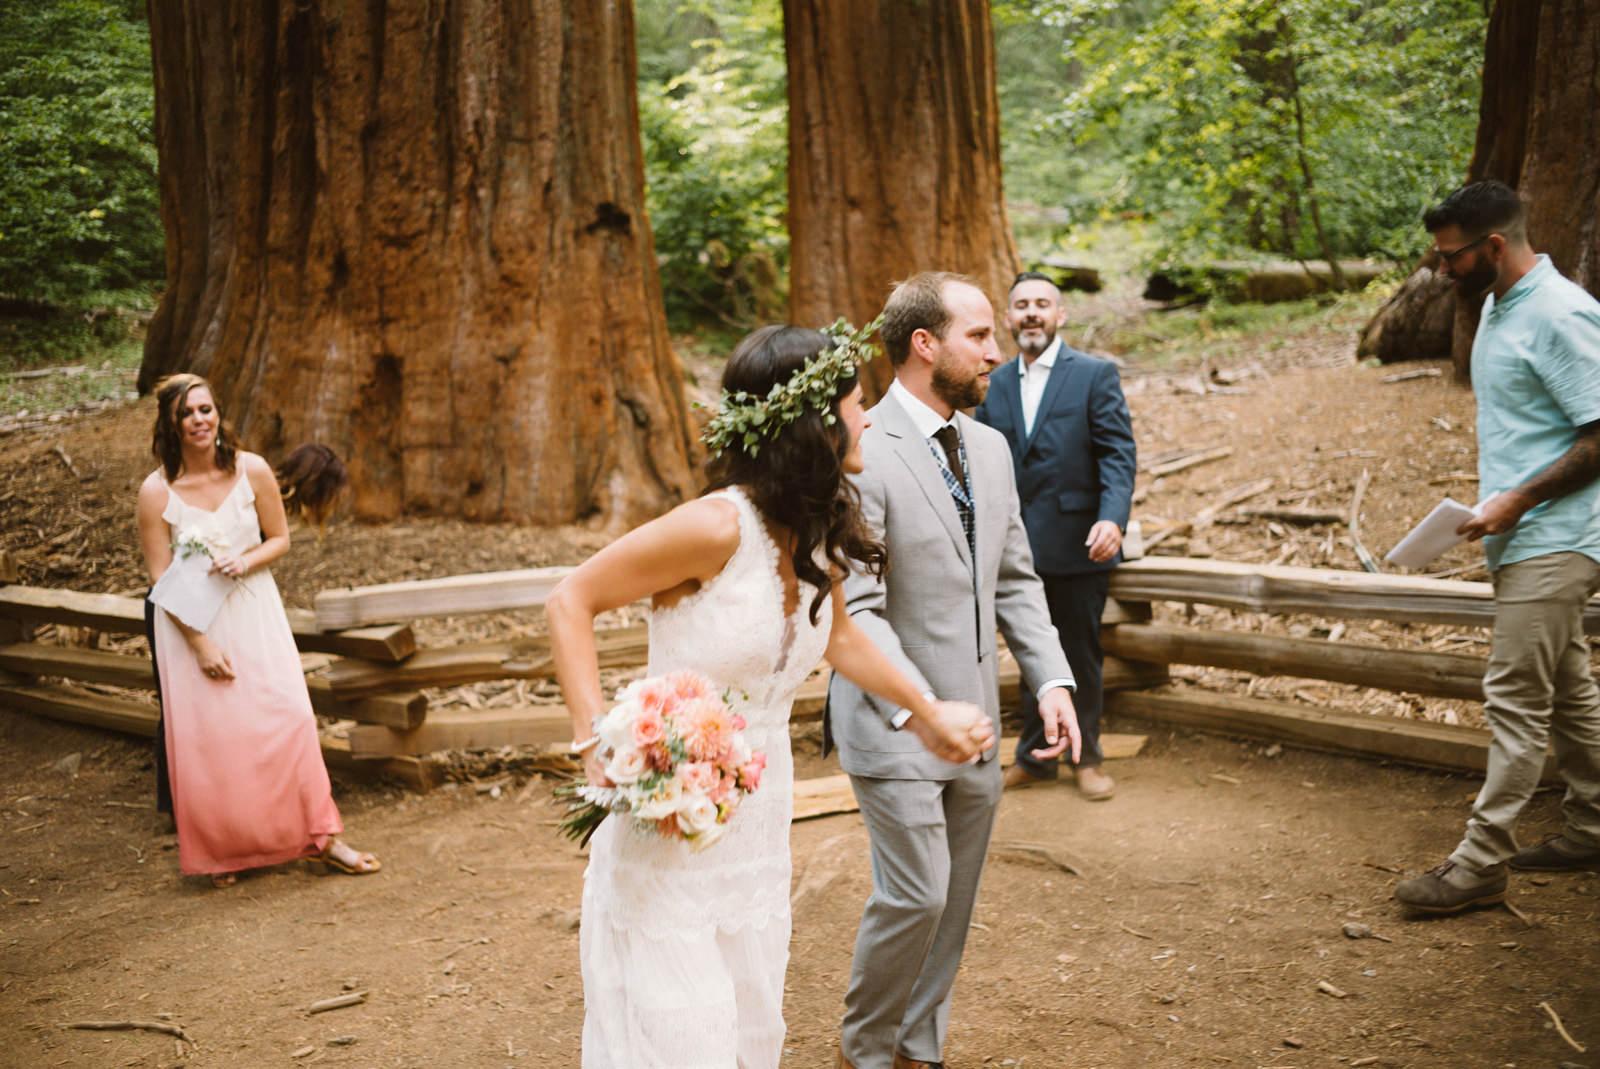 yosemite-intimate-wedding-066 YOSEMITE INTIMATE WEDDING